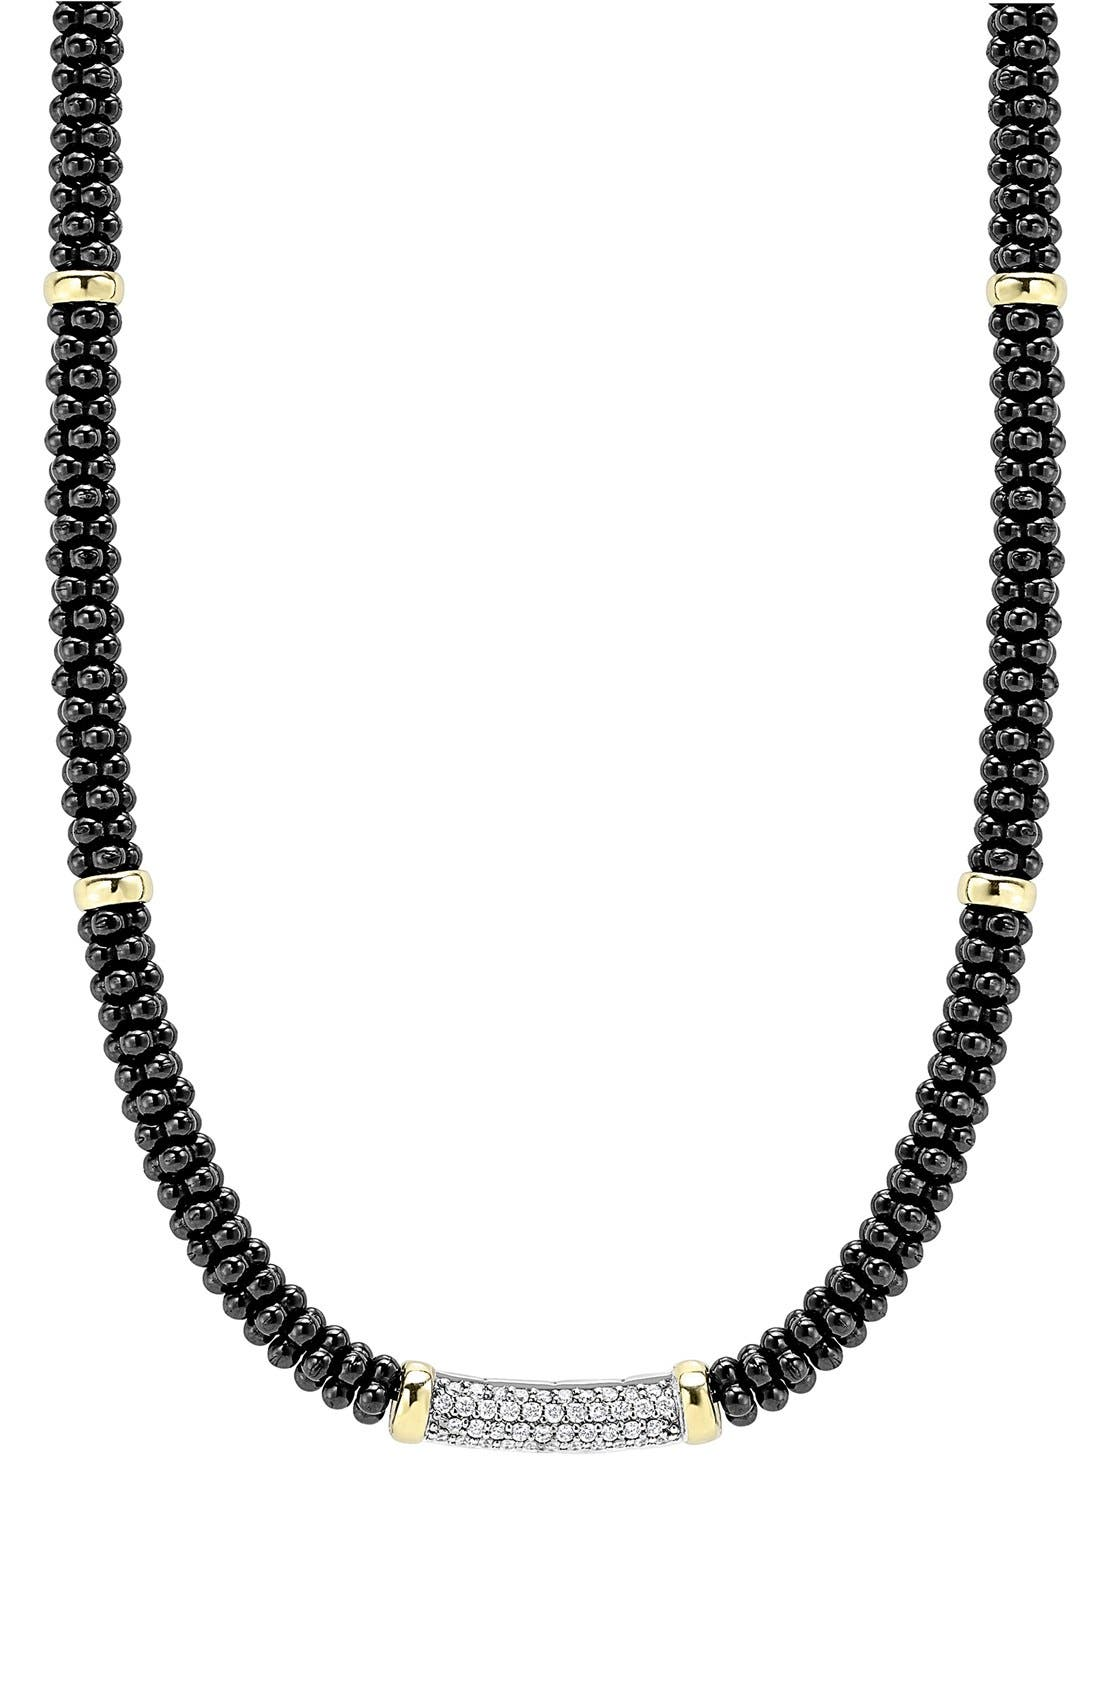 'Black Caviar' 5mm Beaded DiamondBar Necklace,                             Main thumbnail 1, color,                             Black Caviar/ Gold